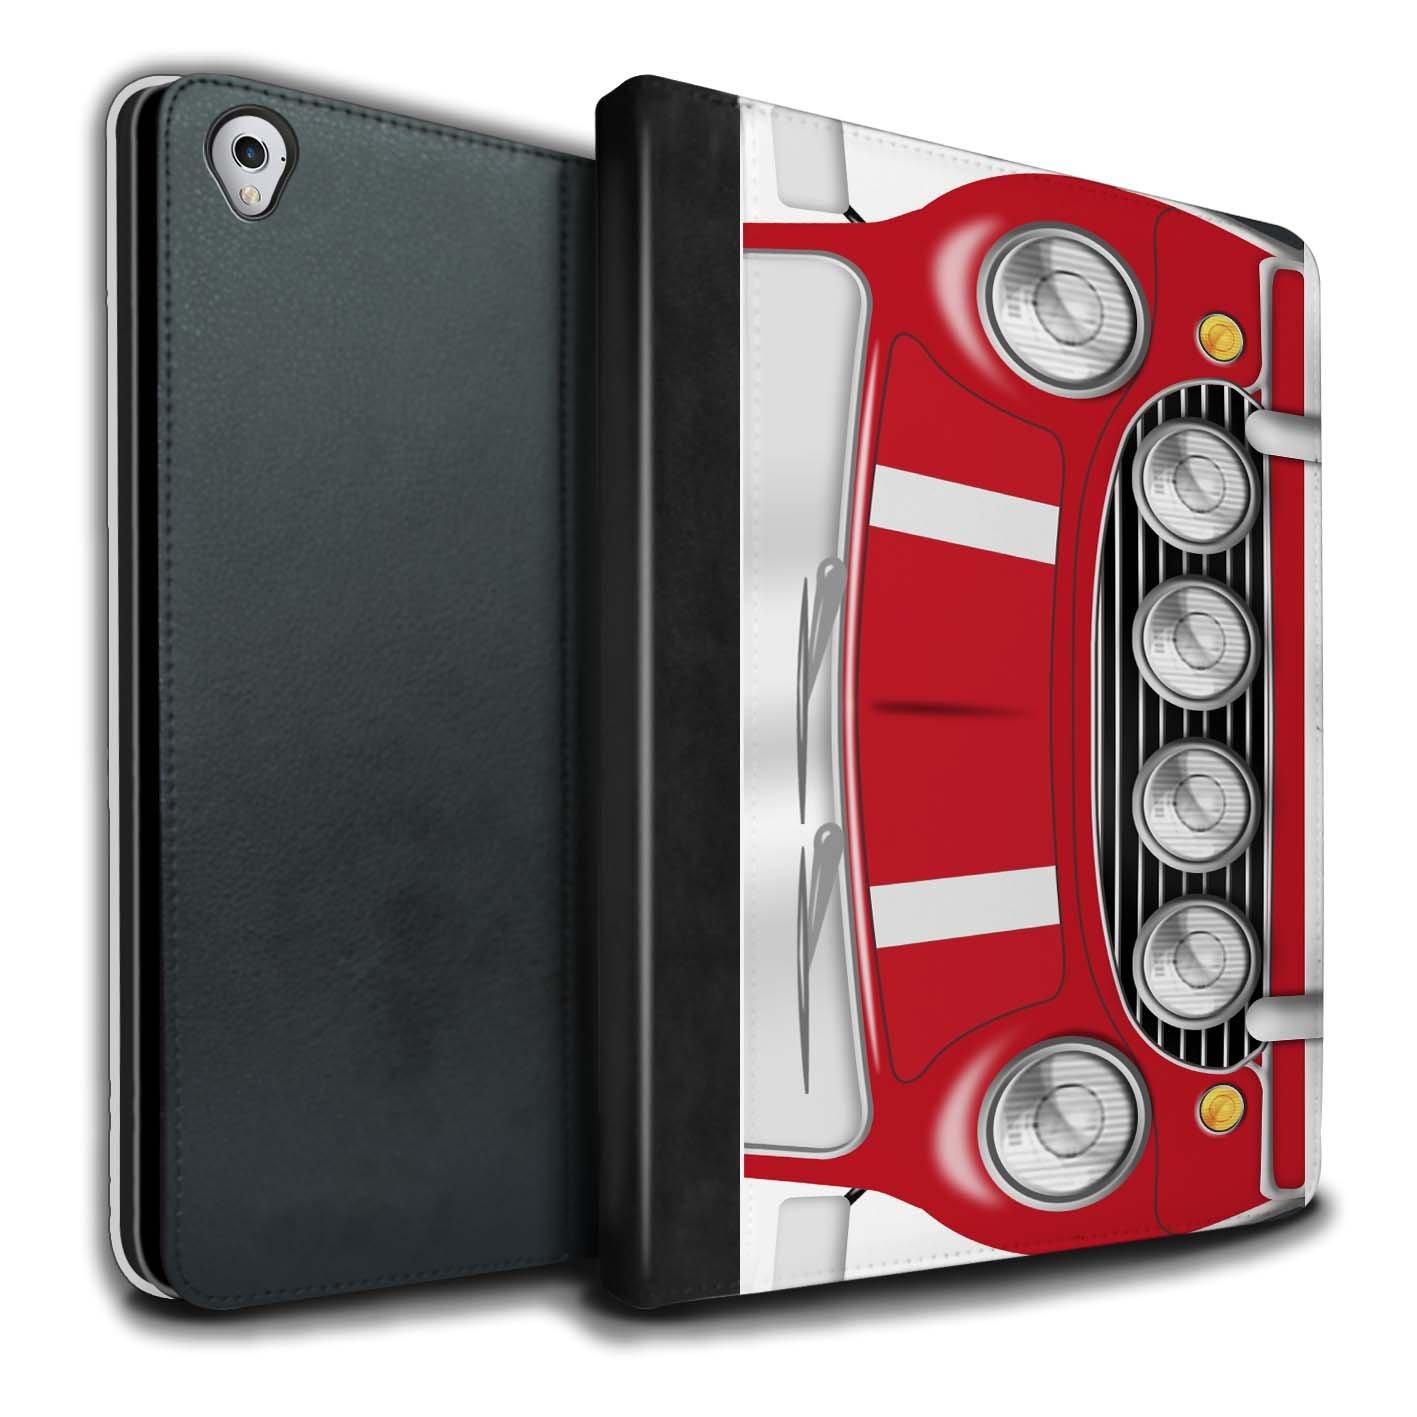 STUFF4 PU Leather Book/Cover Case for Apple iPad Pro 9.7 tablets / Solar Red Design / Classic Retro Mini Collection